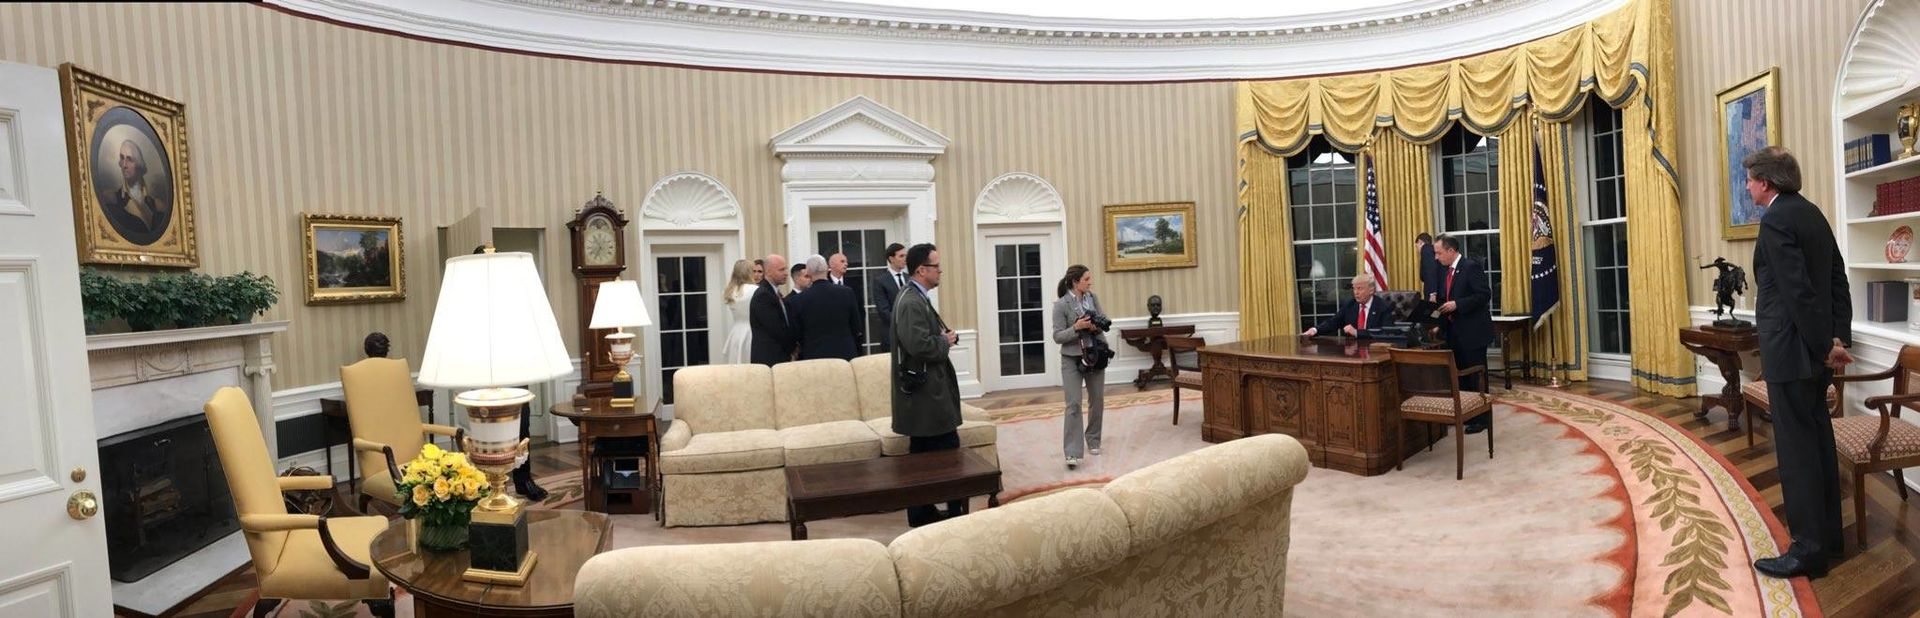 Trump_Oval_Office_panorama